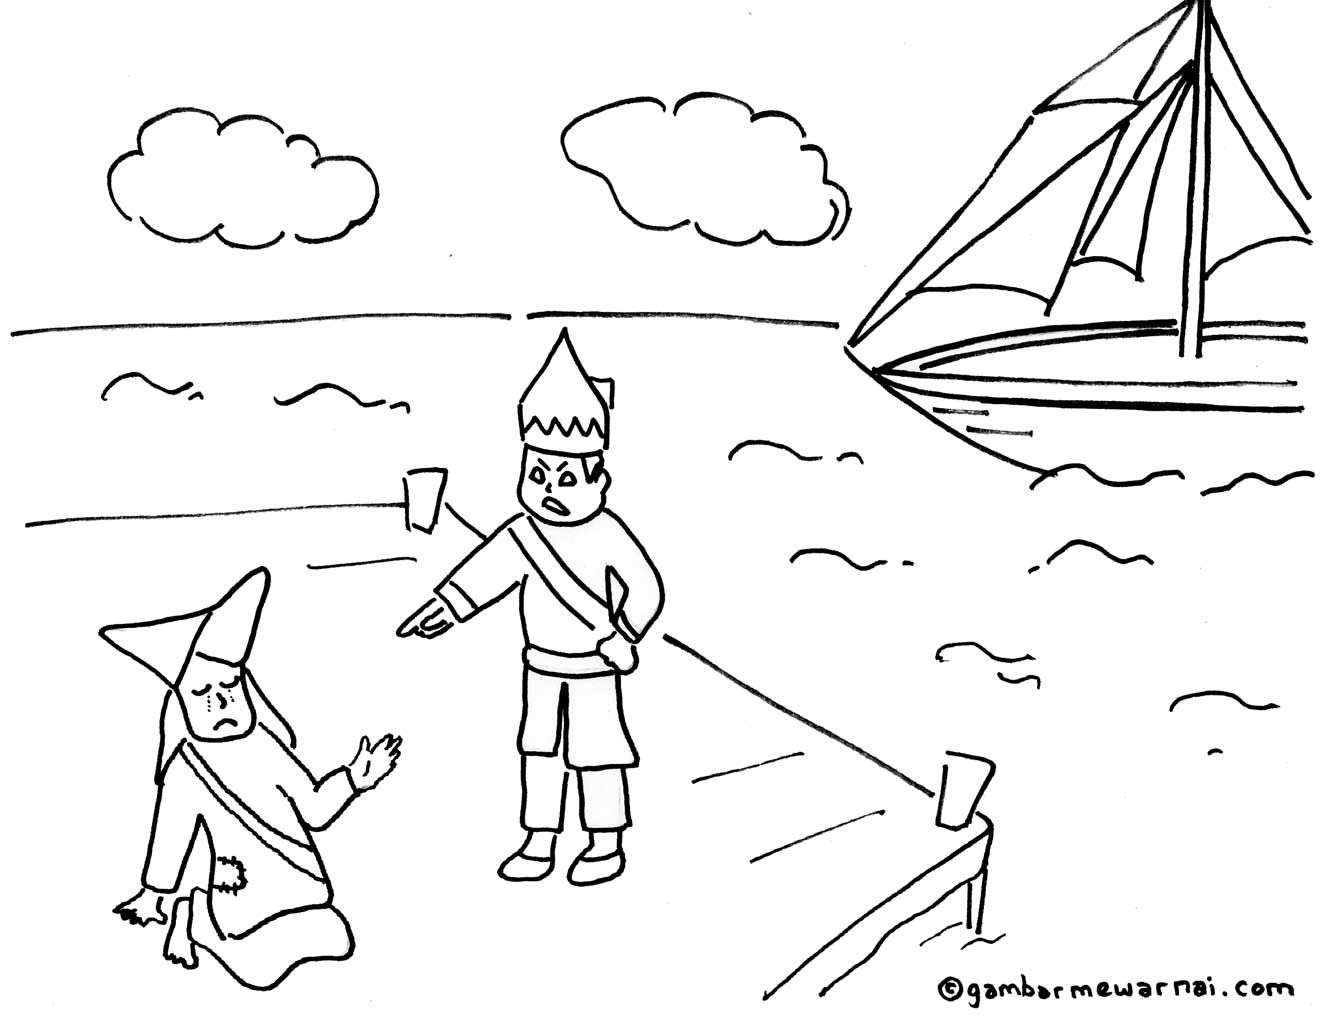 Gambar Mewarnai Dongeng Dan Cerita Rakyat Iman Projects To Try